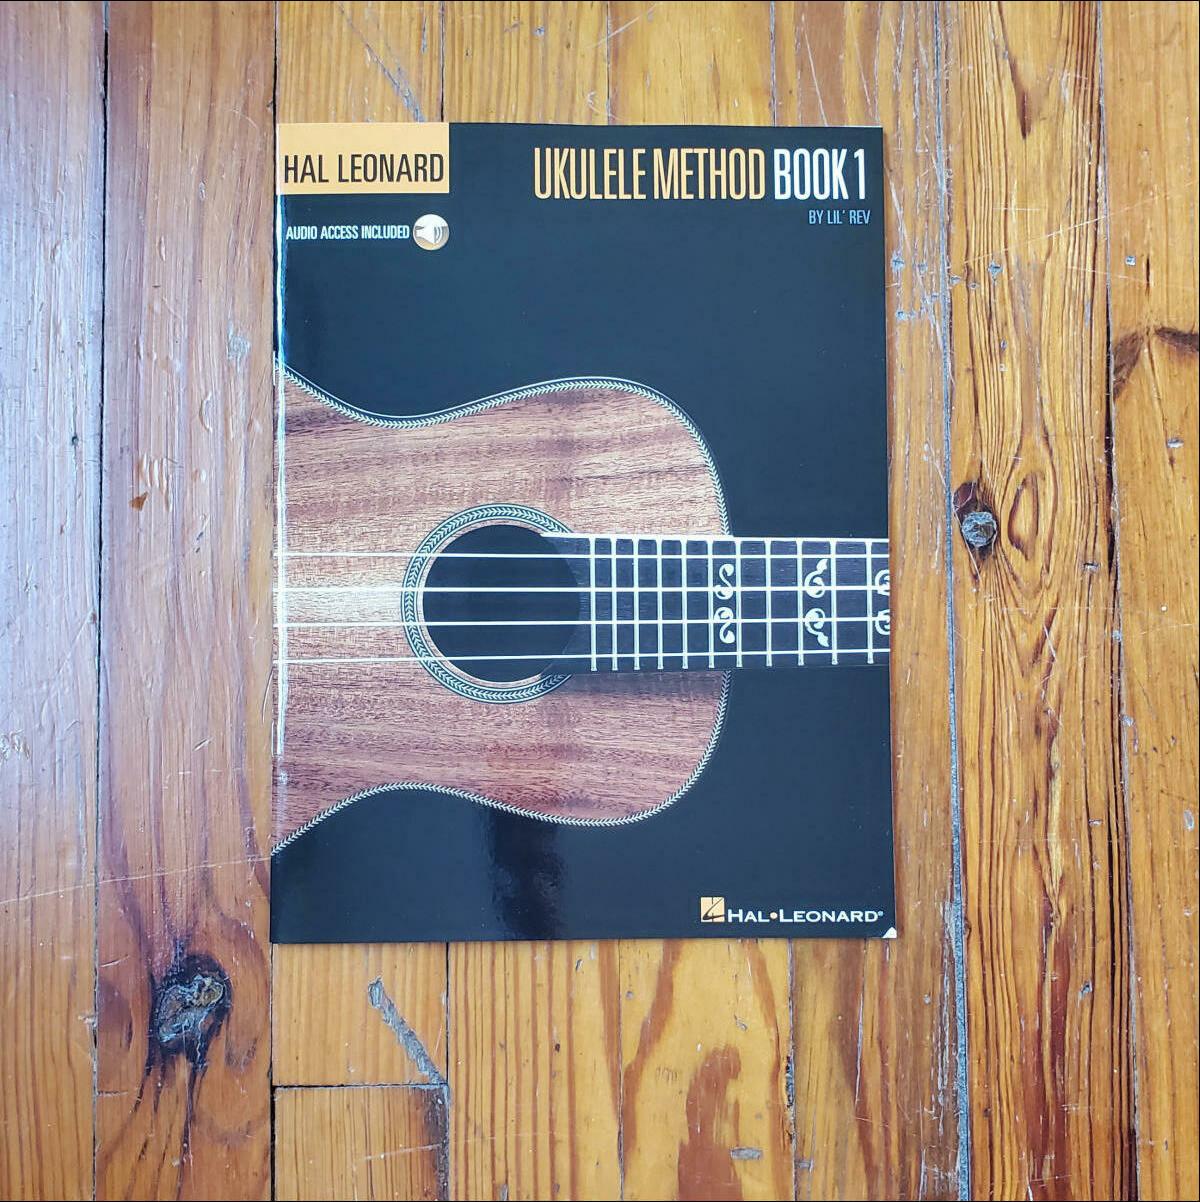 Ukulele Method Book 1 by: Lil' Rev